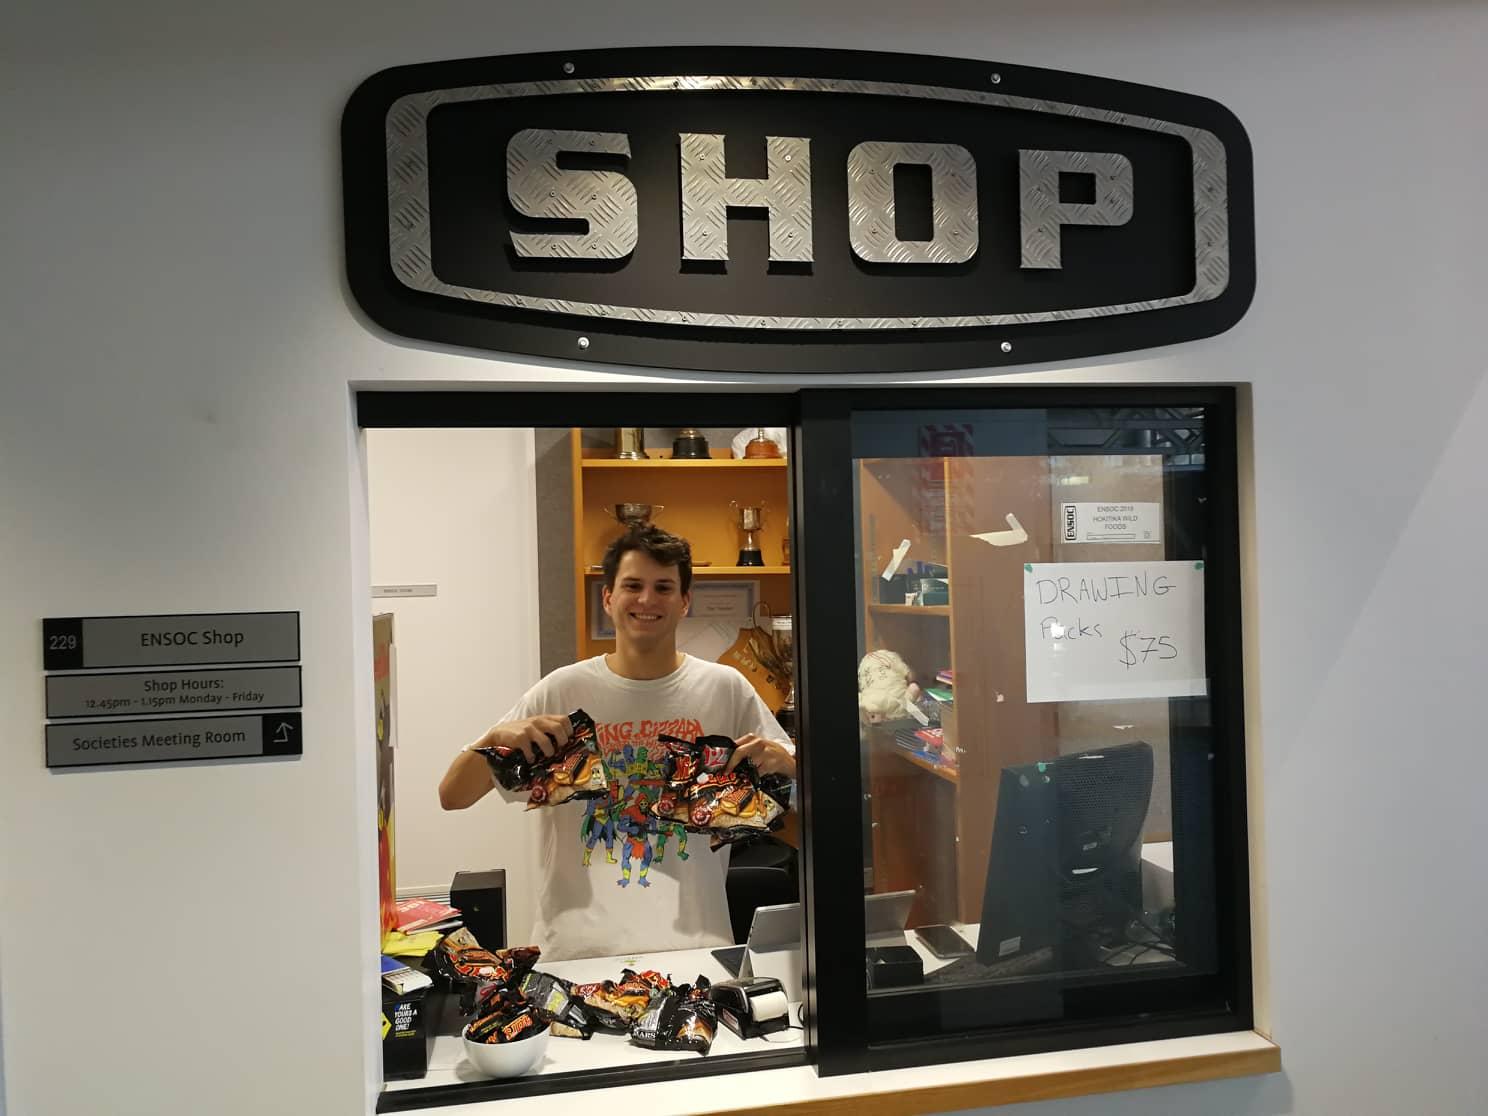 Boy working at ENSOC shop